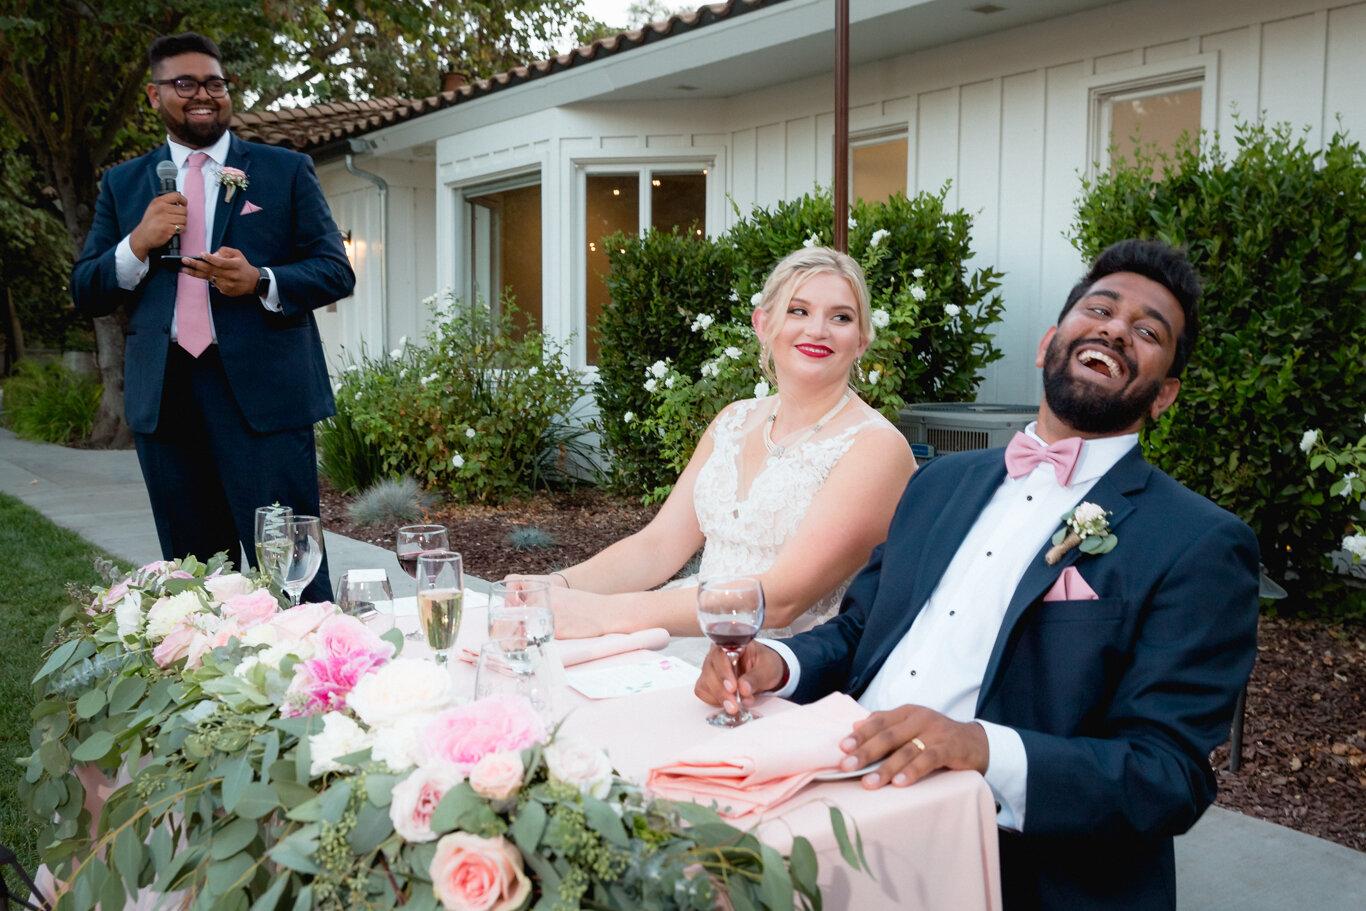 2019.08.24_Emily-Ashir-Wedding-at-the-Maples-6288.jpg